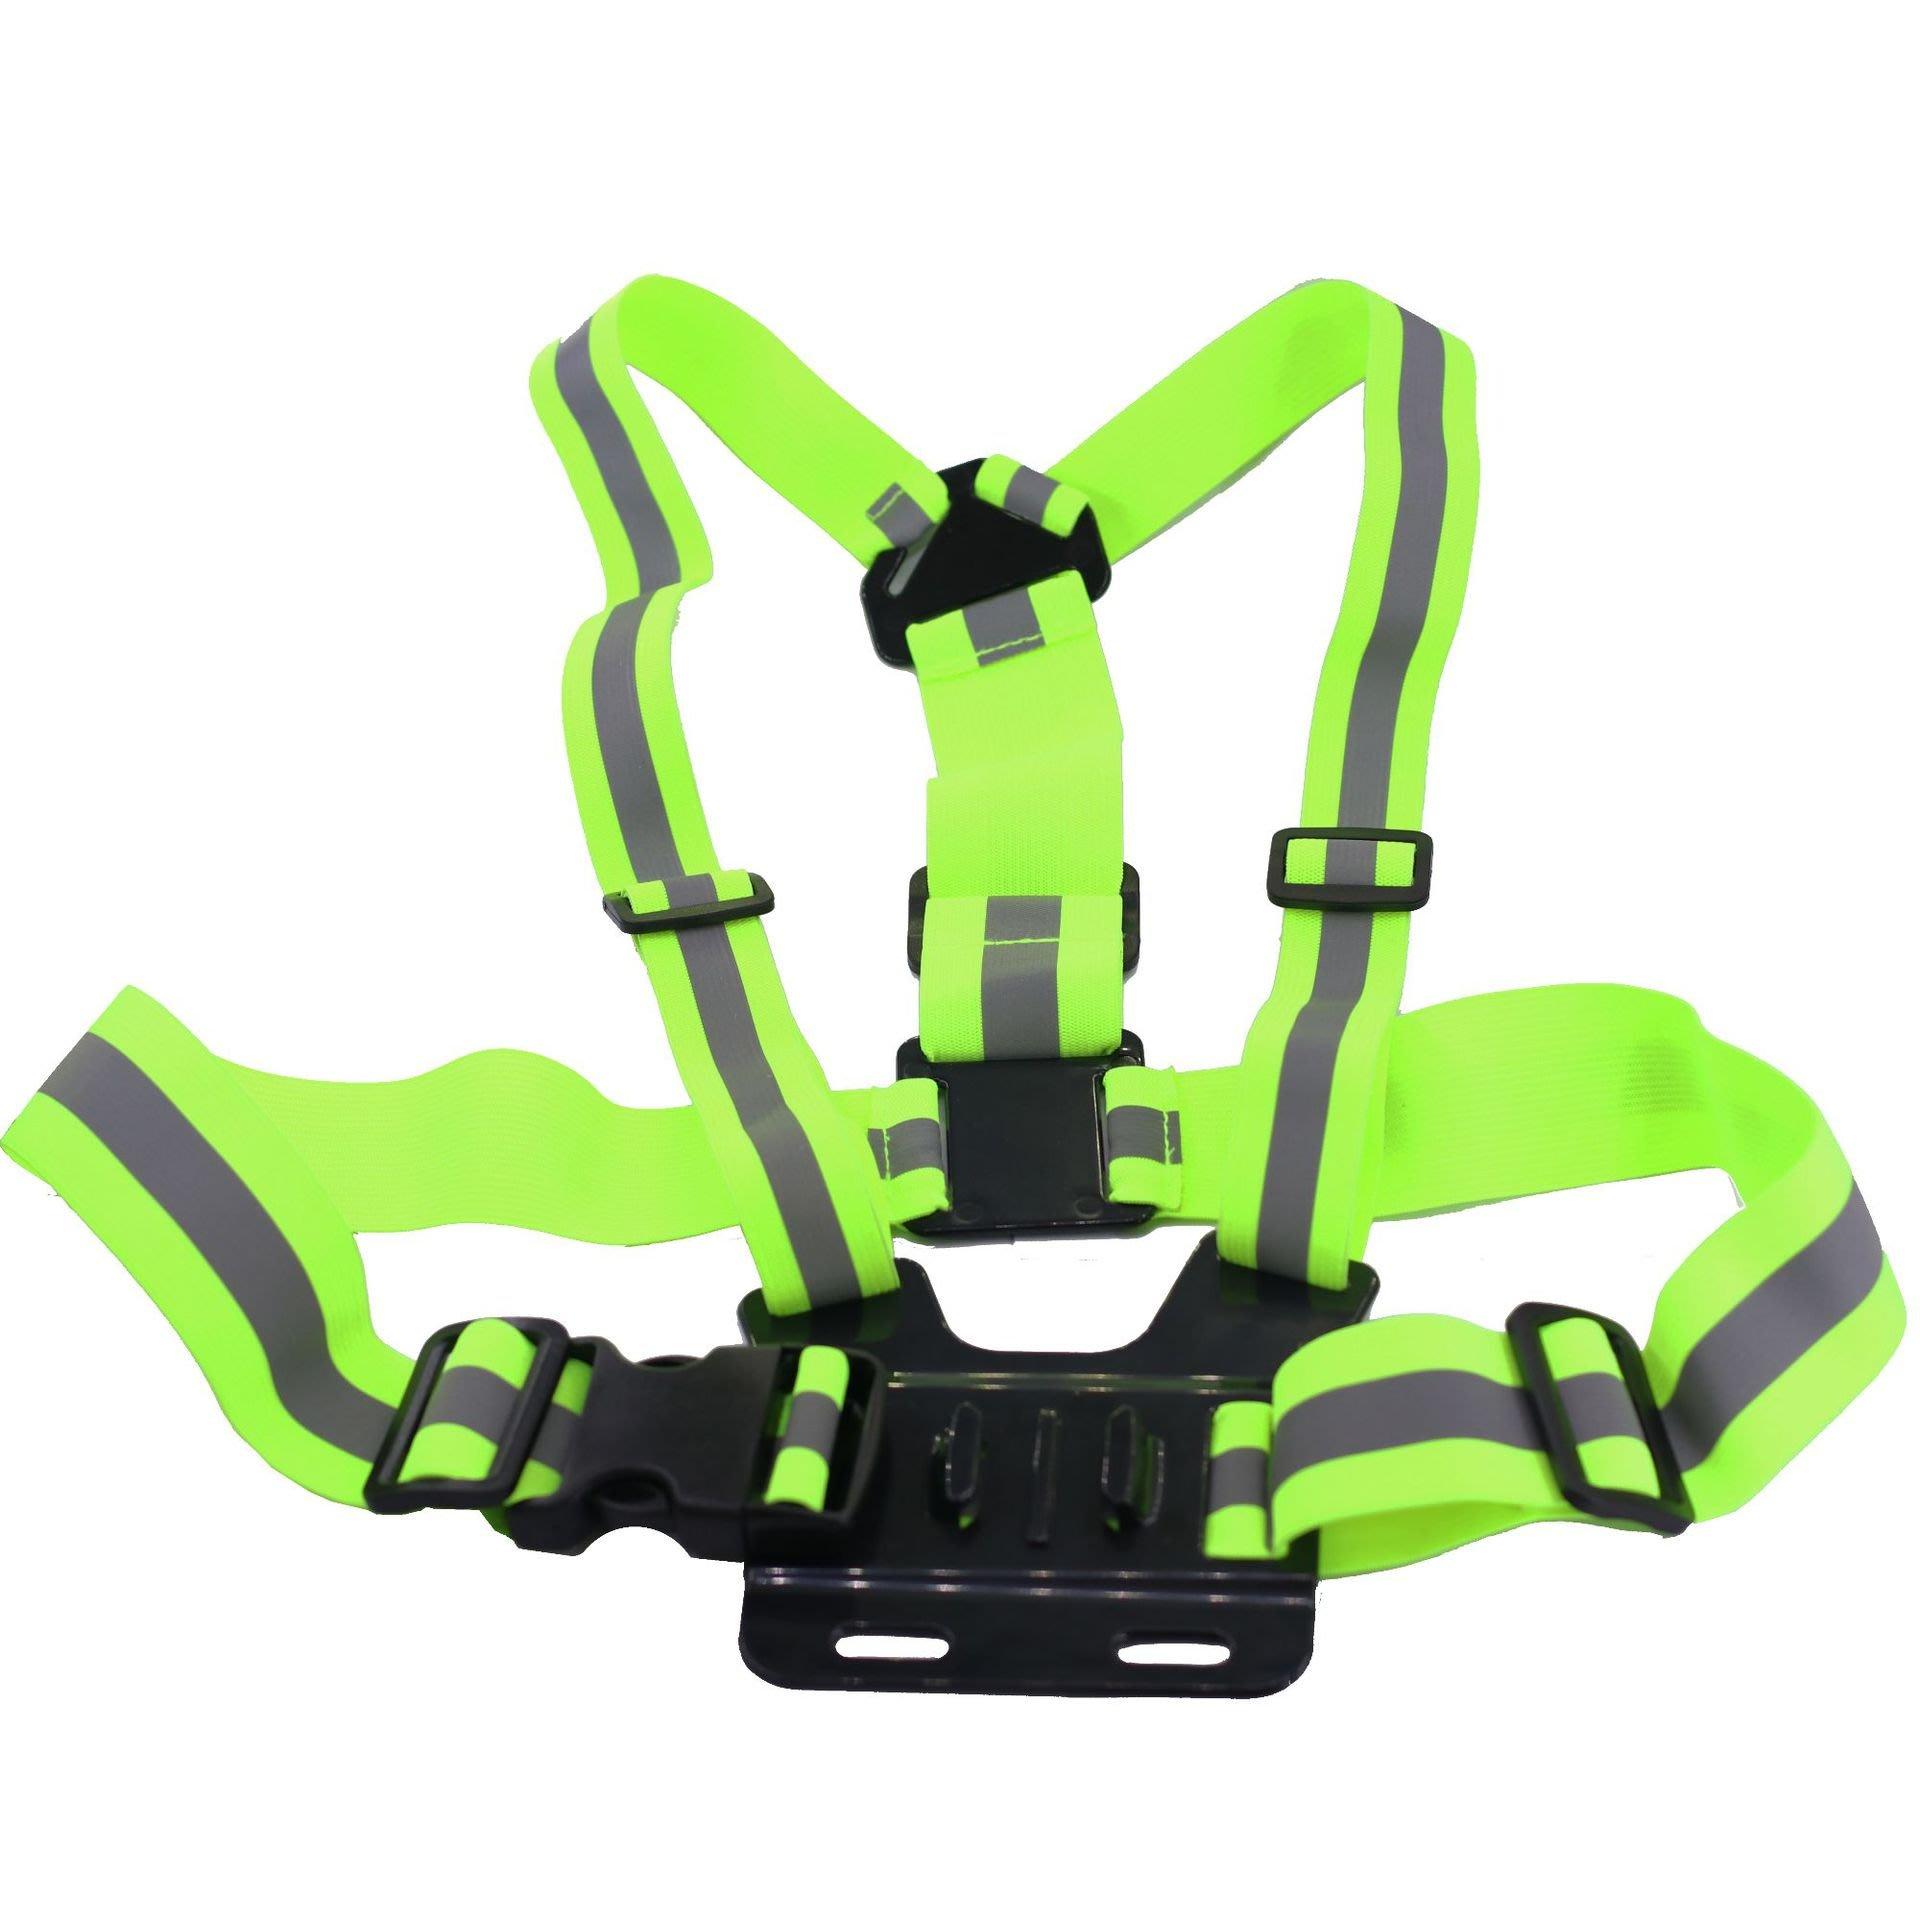 Gopro運動攝影機配件 胸背帶 hero3+ 胸帶 胸前固定肩帶B款 SJCAM SJ4000 M10 螢光綠